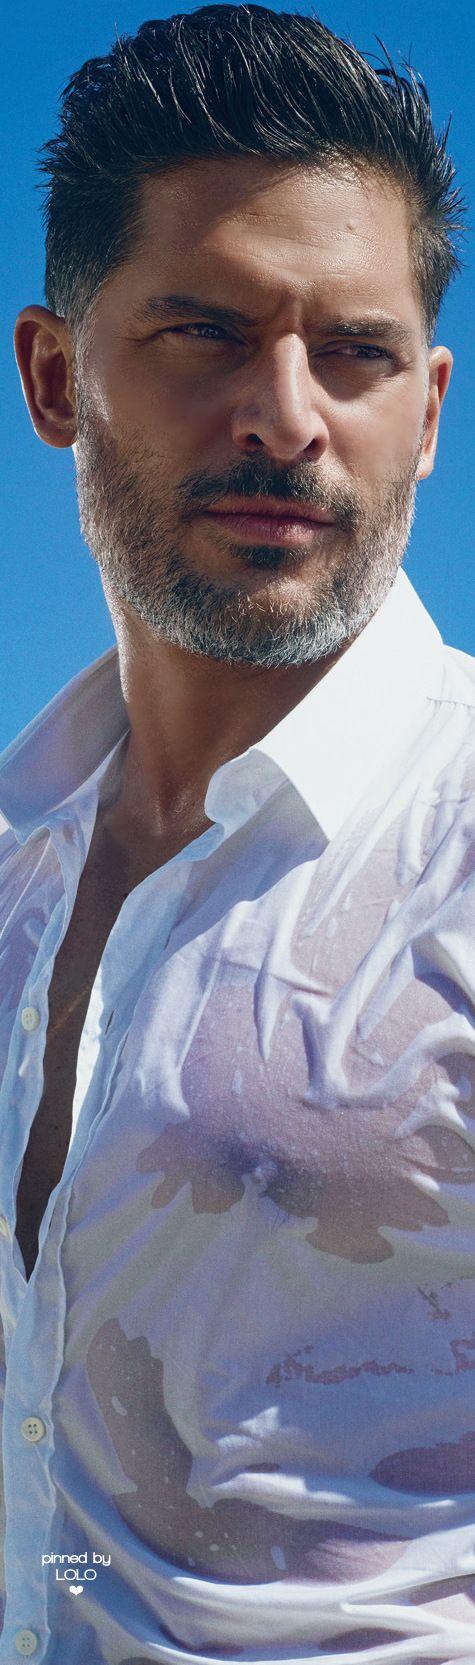 Joe Manganiello for Detail Magazine | LOLO❤︎